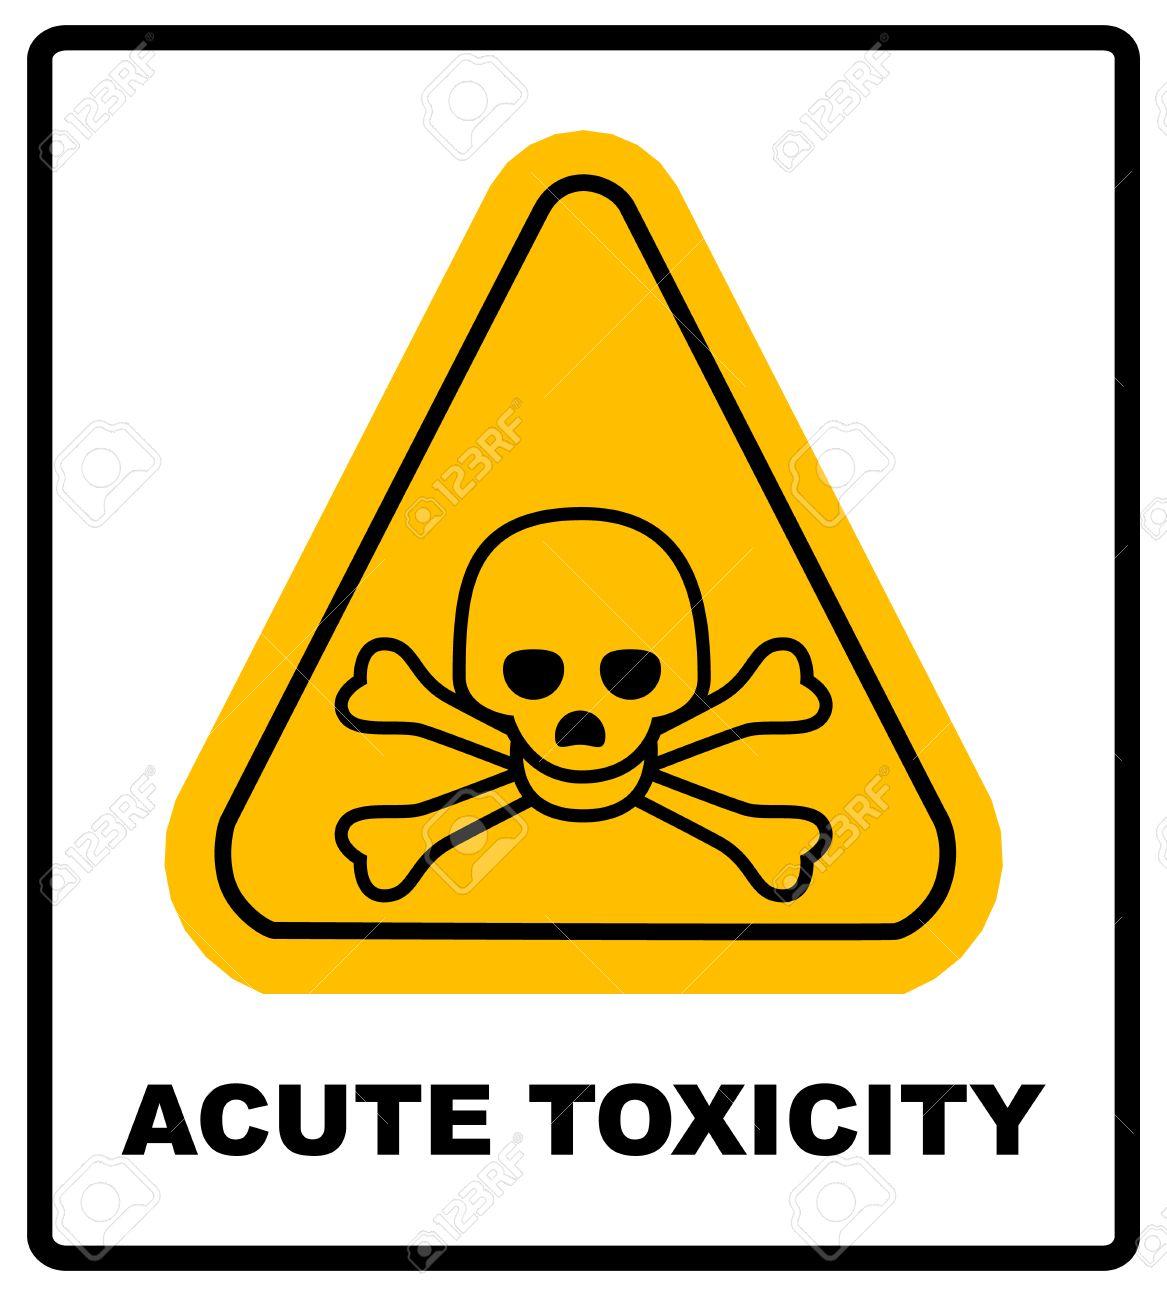 Hazard Pictogram Acute Toxicity Hazard Symbol Vector Banner